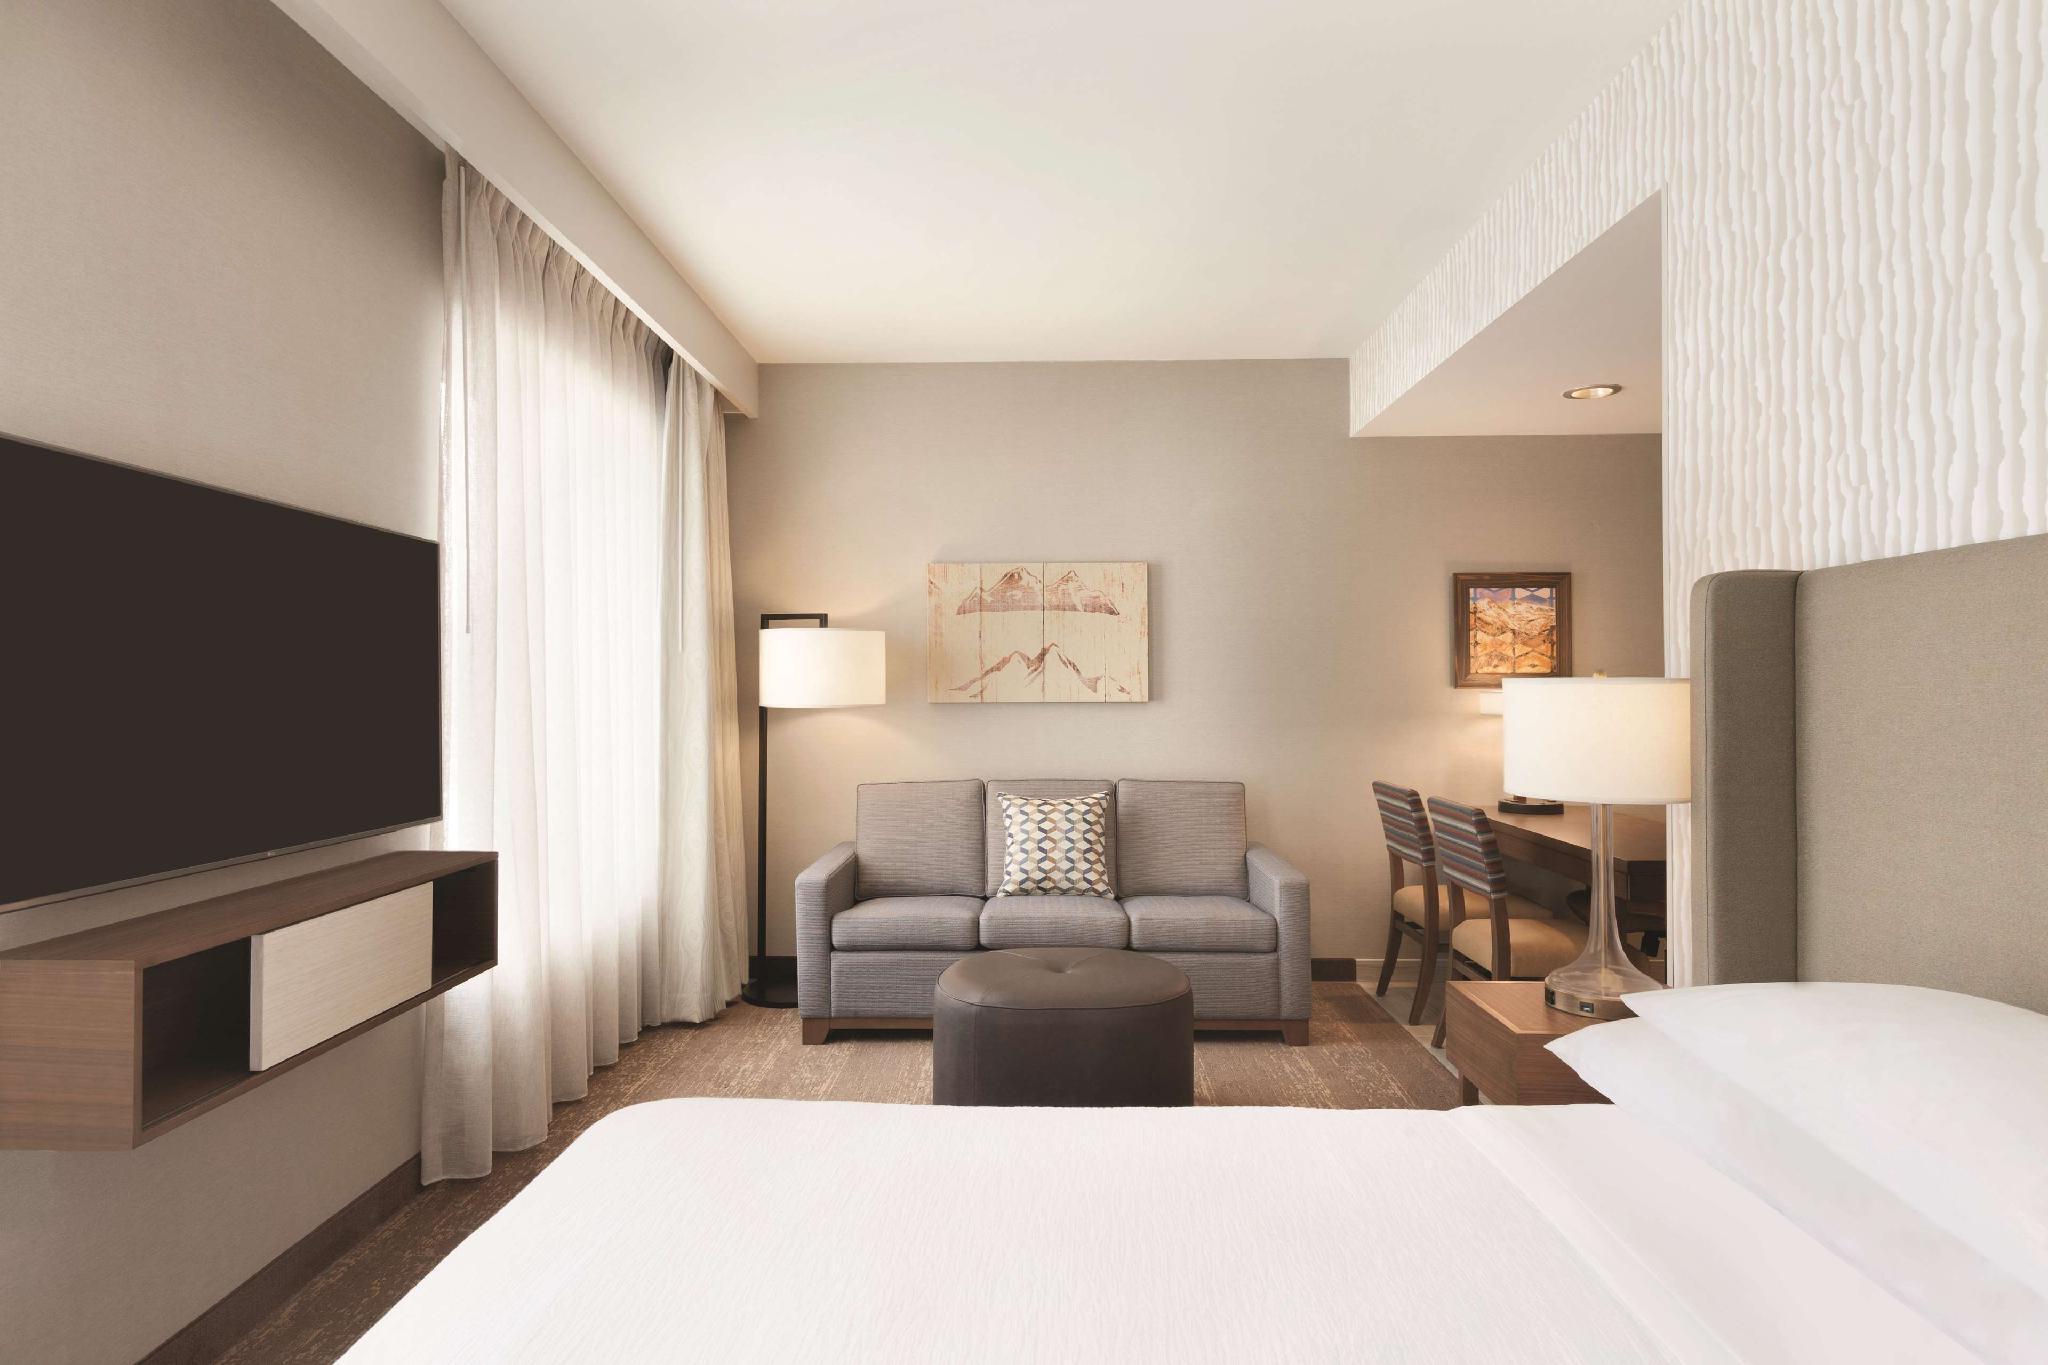 Embassy Suites by Hilton South Jordan Salt Lake City, Salt Lake